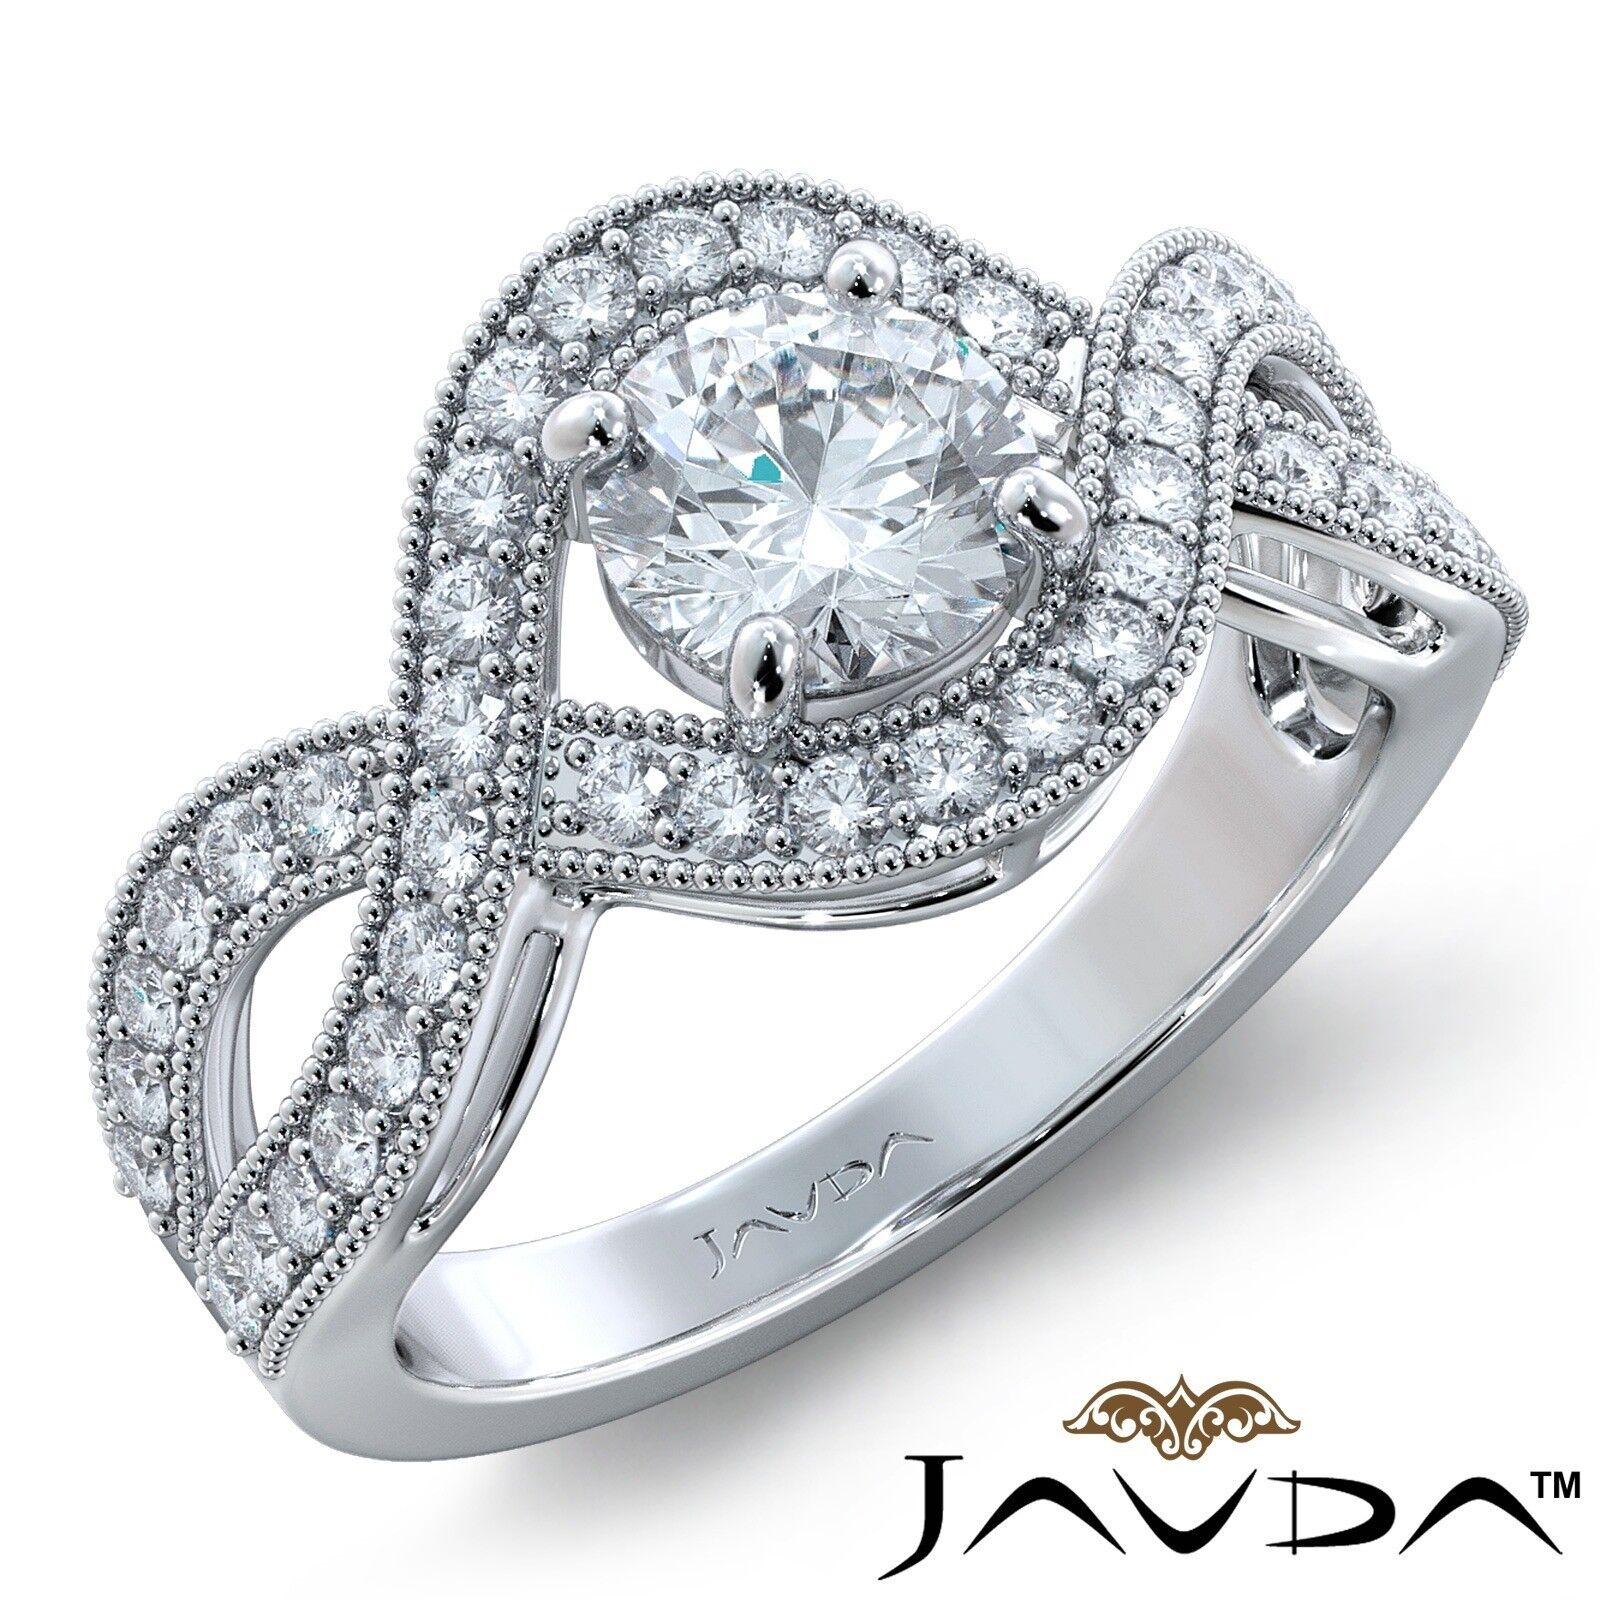 1.95ctw Milgrain Halo Side Stone Round Diamond Engagement Ring GIA F-VVS2 W Gold